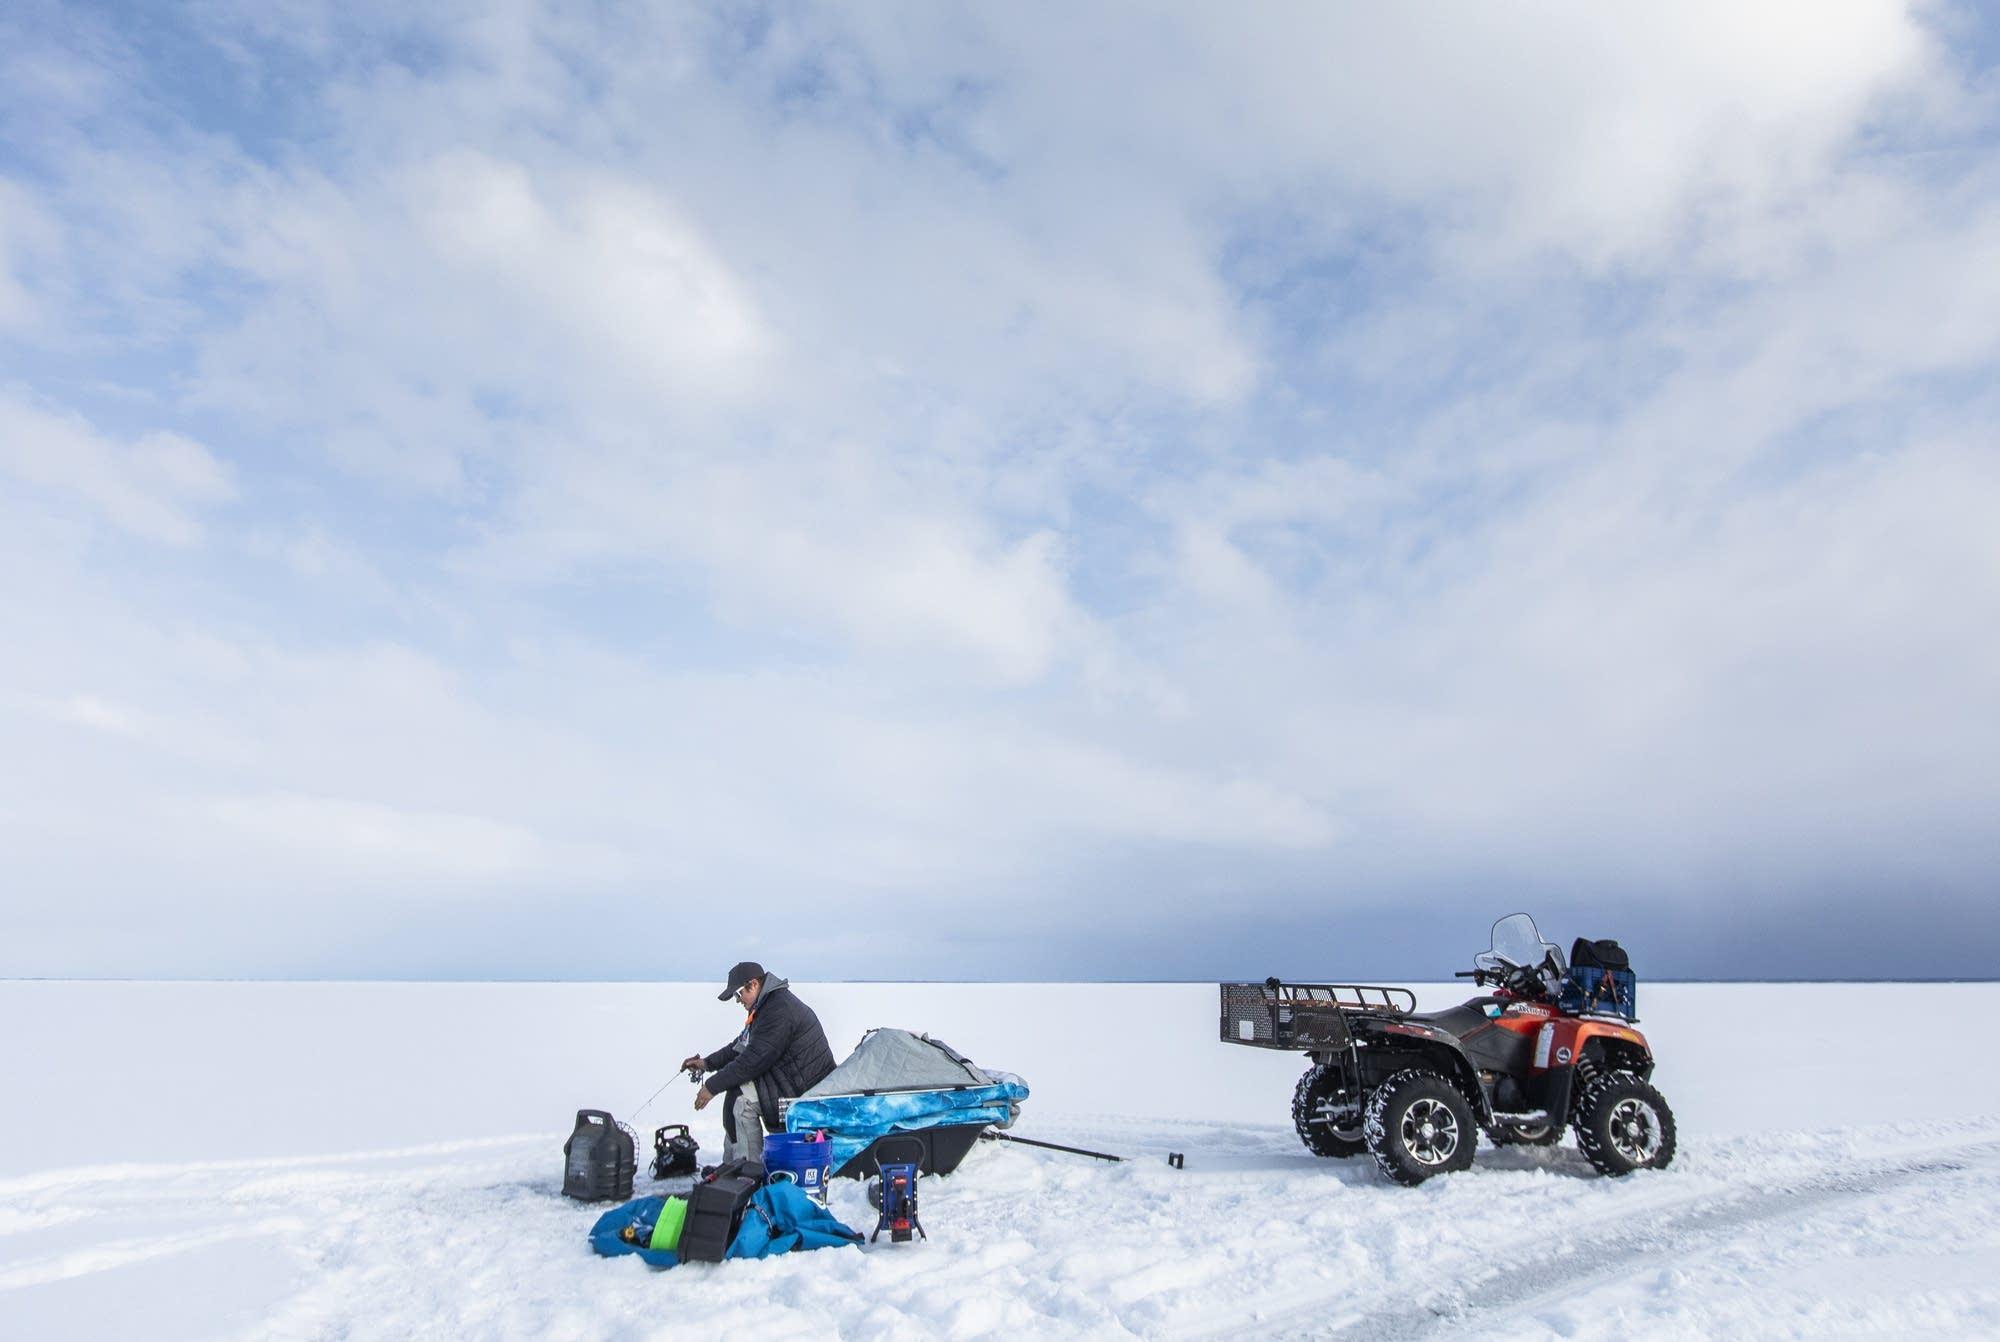 Rikki Pardun ice fishes on Lake Superior near Washburn Wis